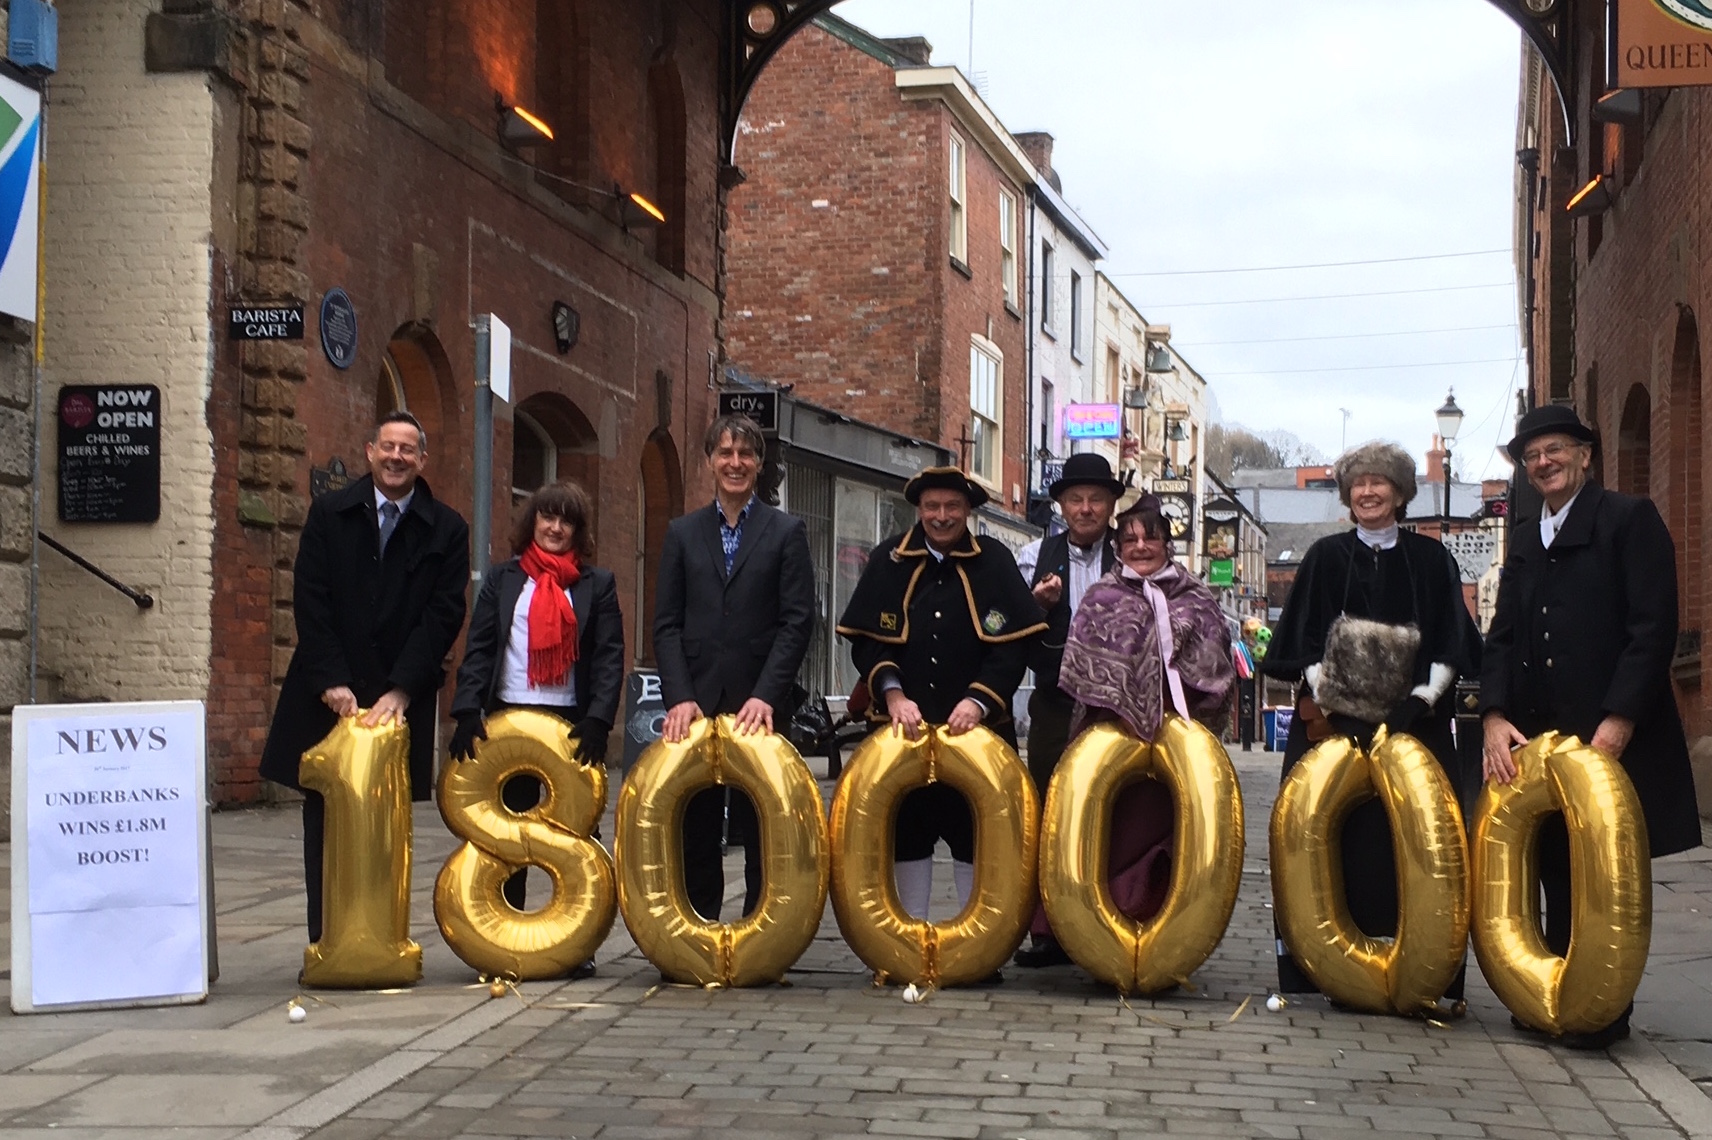 £1.8million funding boost for Stockport's Underbanks